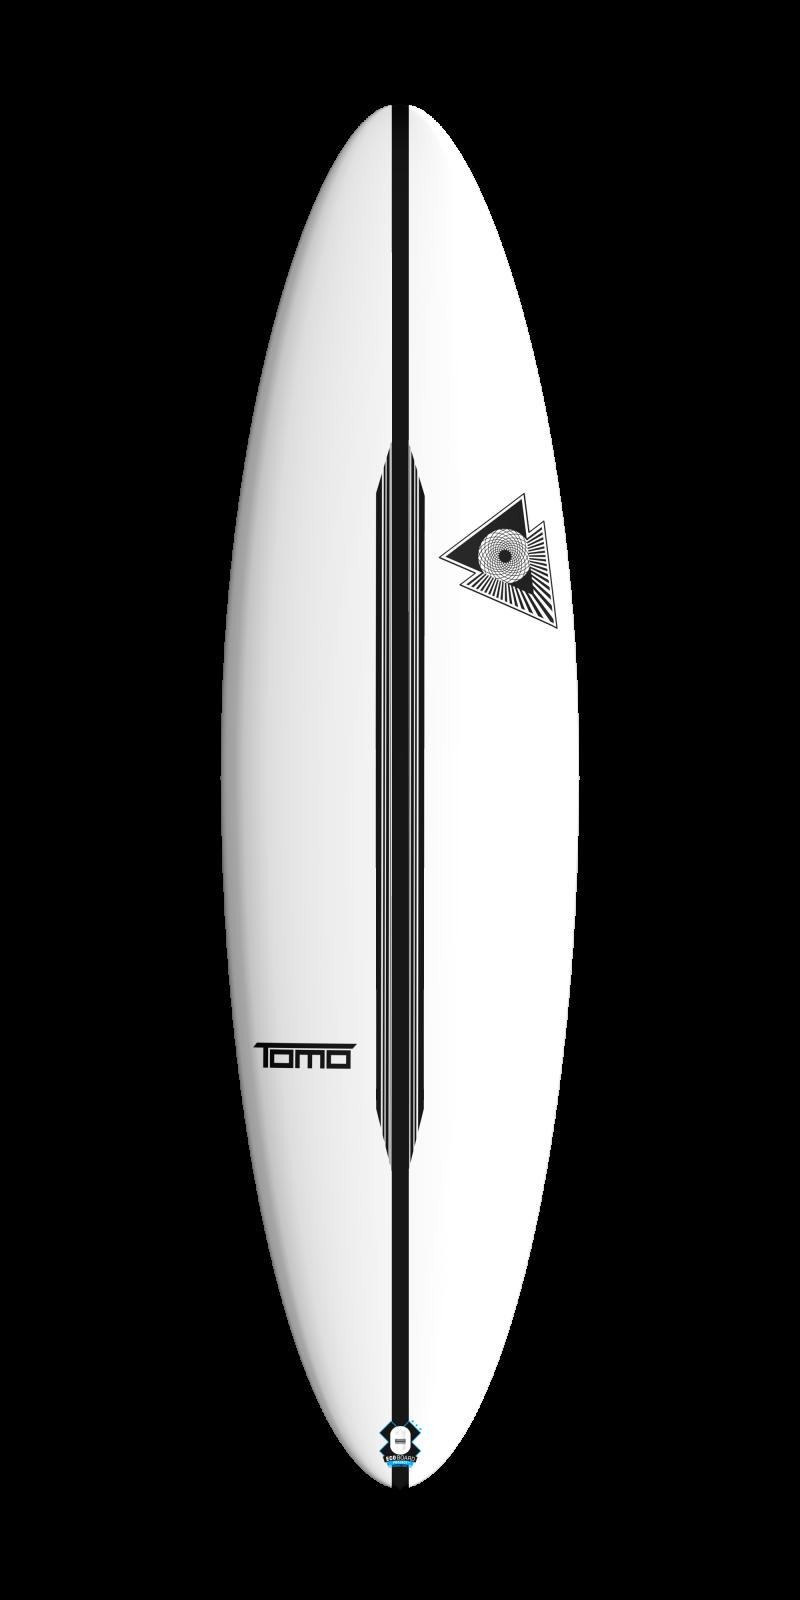 Firewire LFT Hydronaut Surfboard (Special Order)